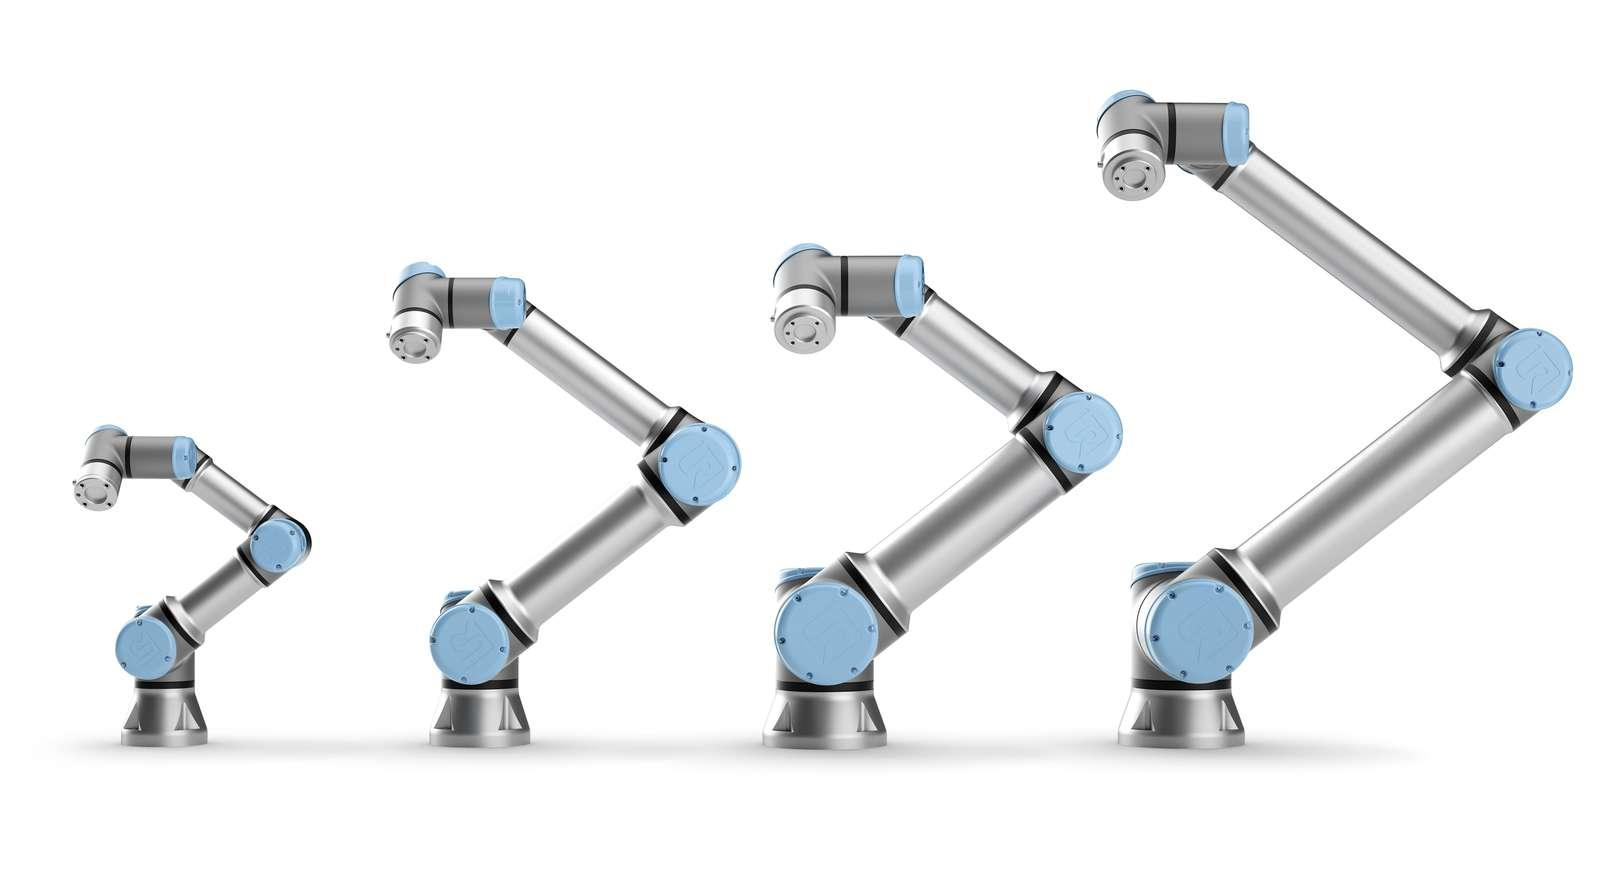 UNIVERSAL ROBOTS, LA CASA DELLA ROBOTICA COLLABORATIVA